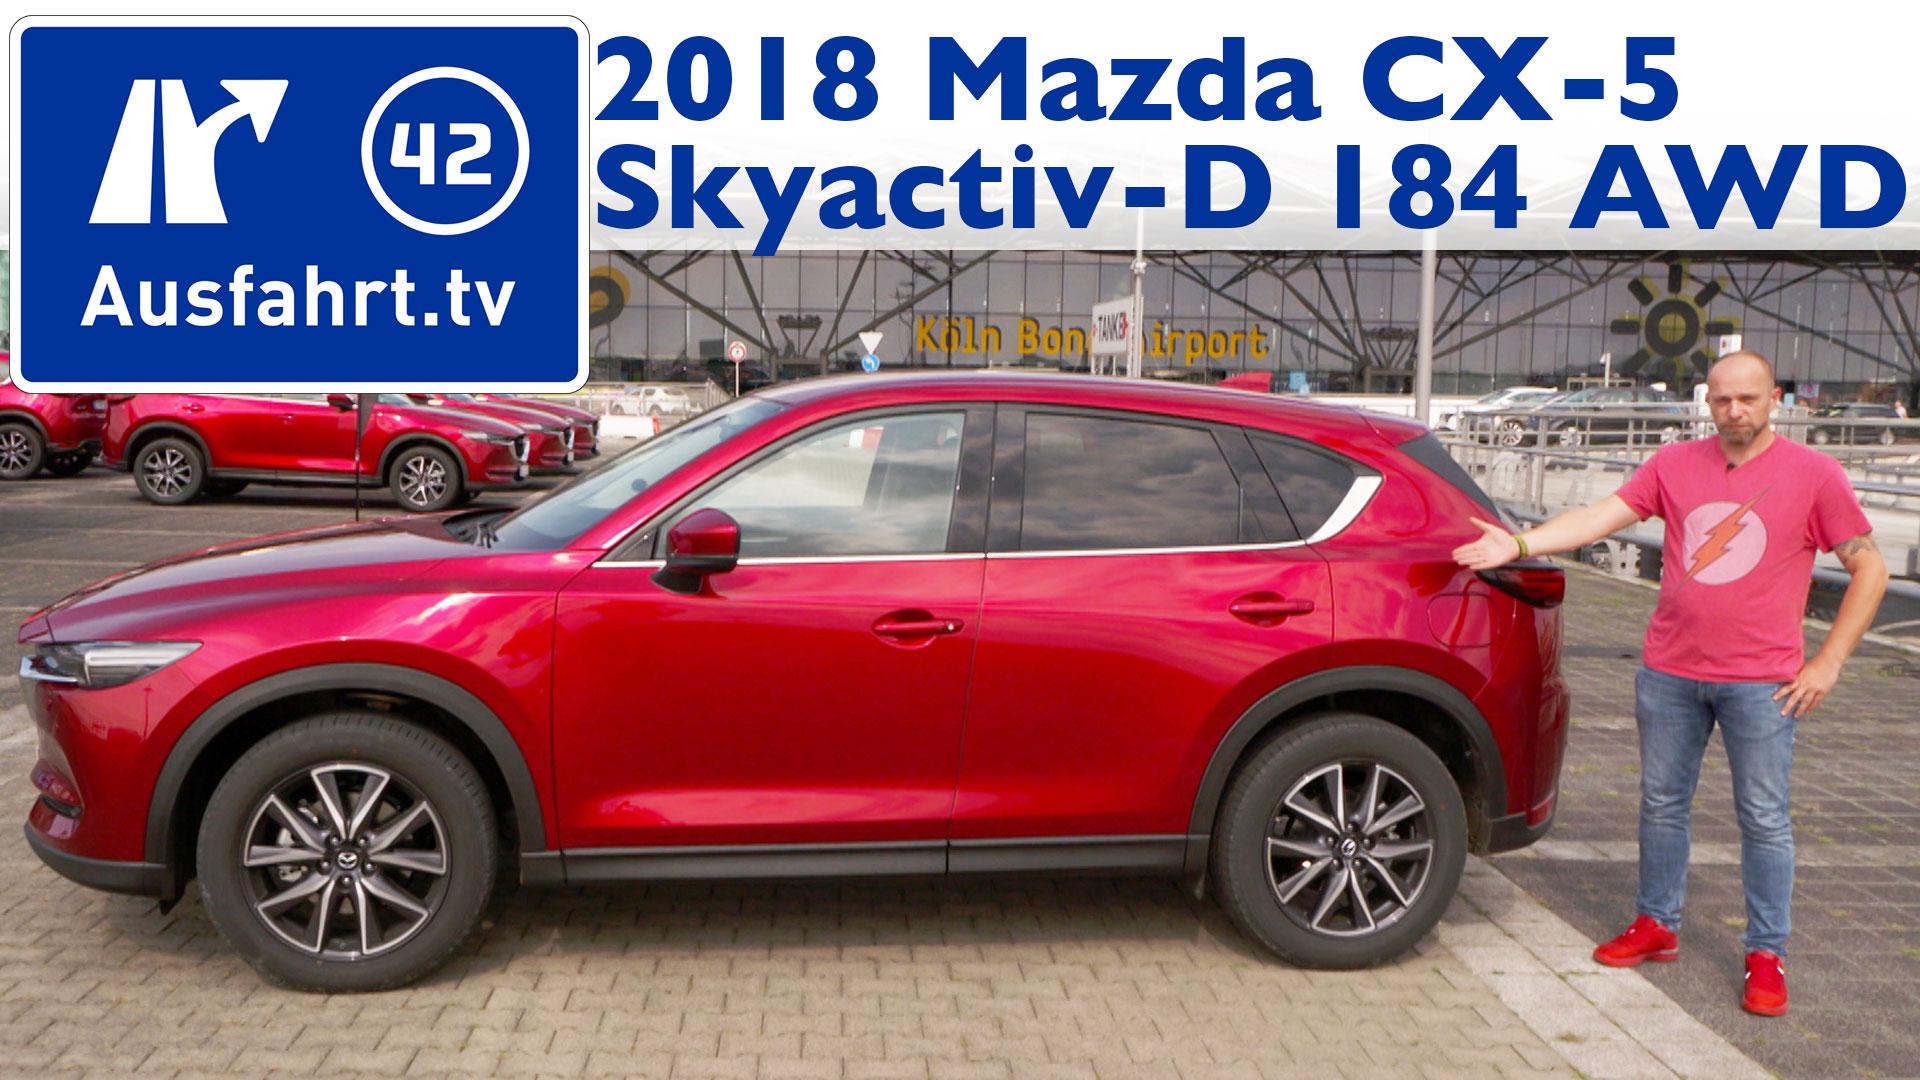 2018 Mazda Cx 5 Skyactiv D 184 Awd Sports Line My2018 Ausfahrttv